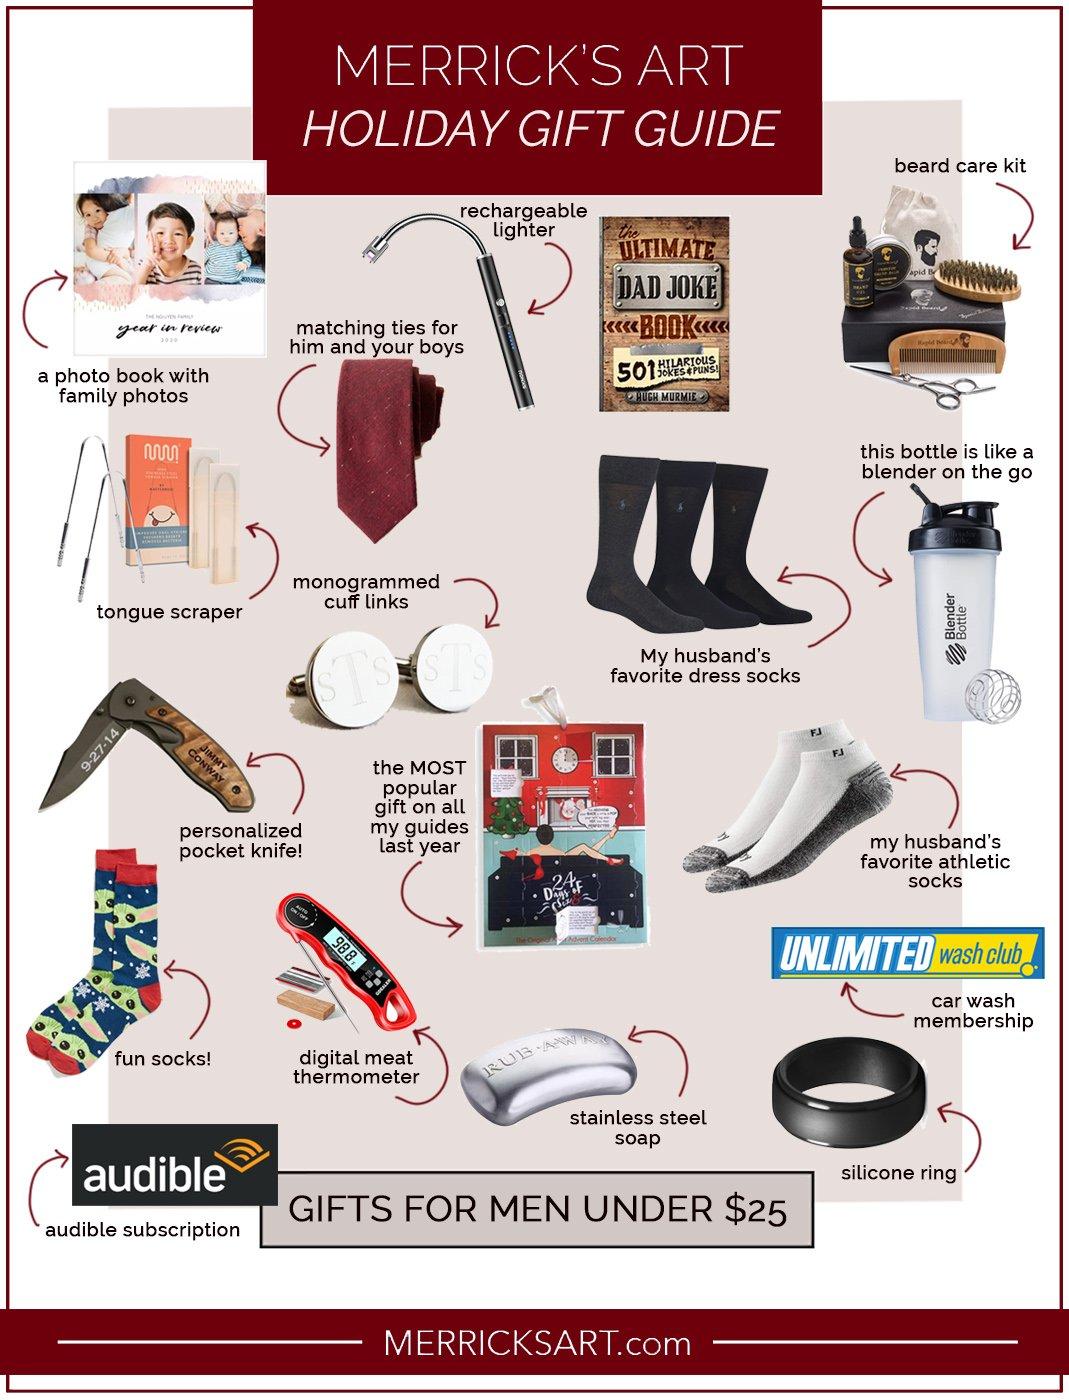 gifts for men under $25